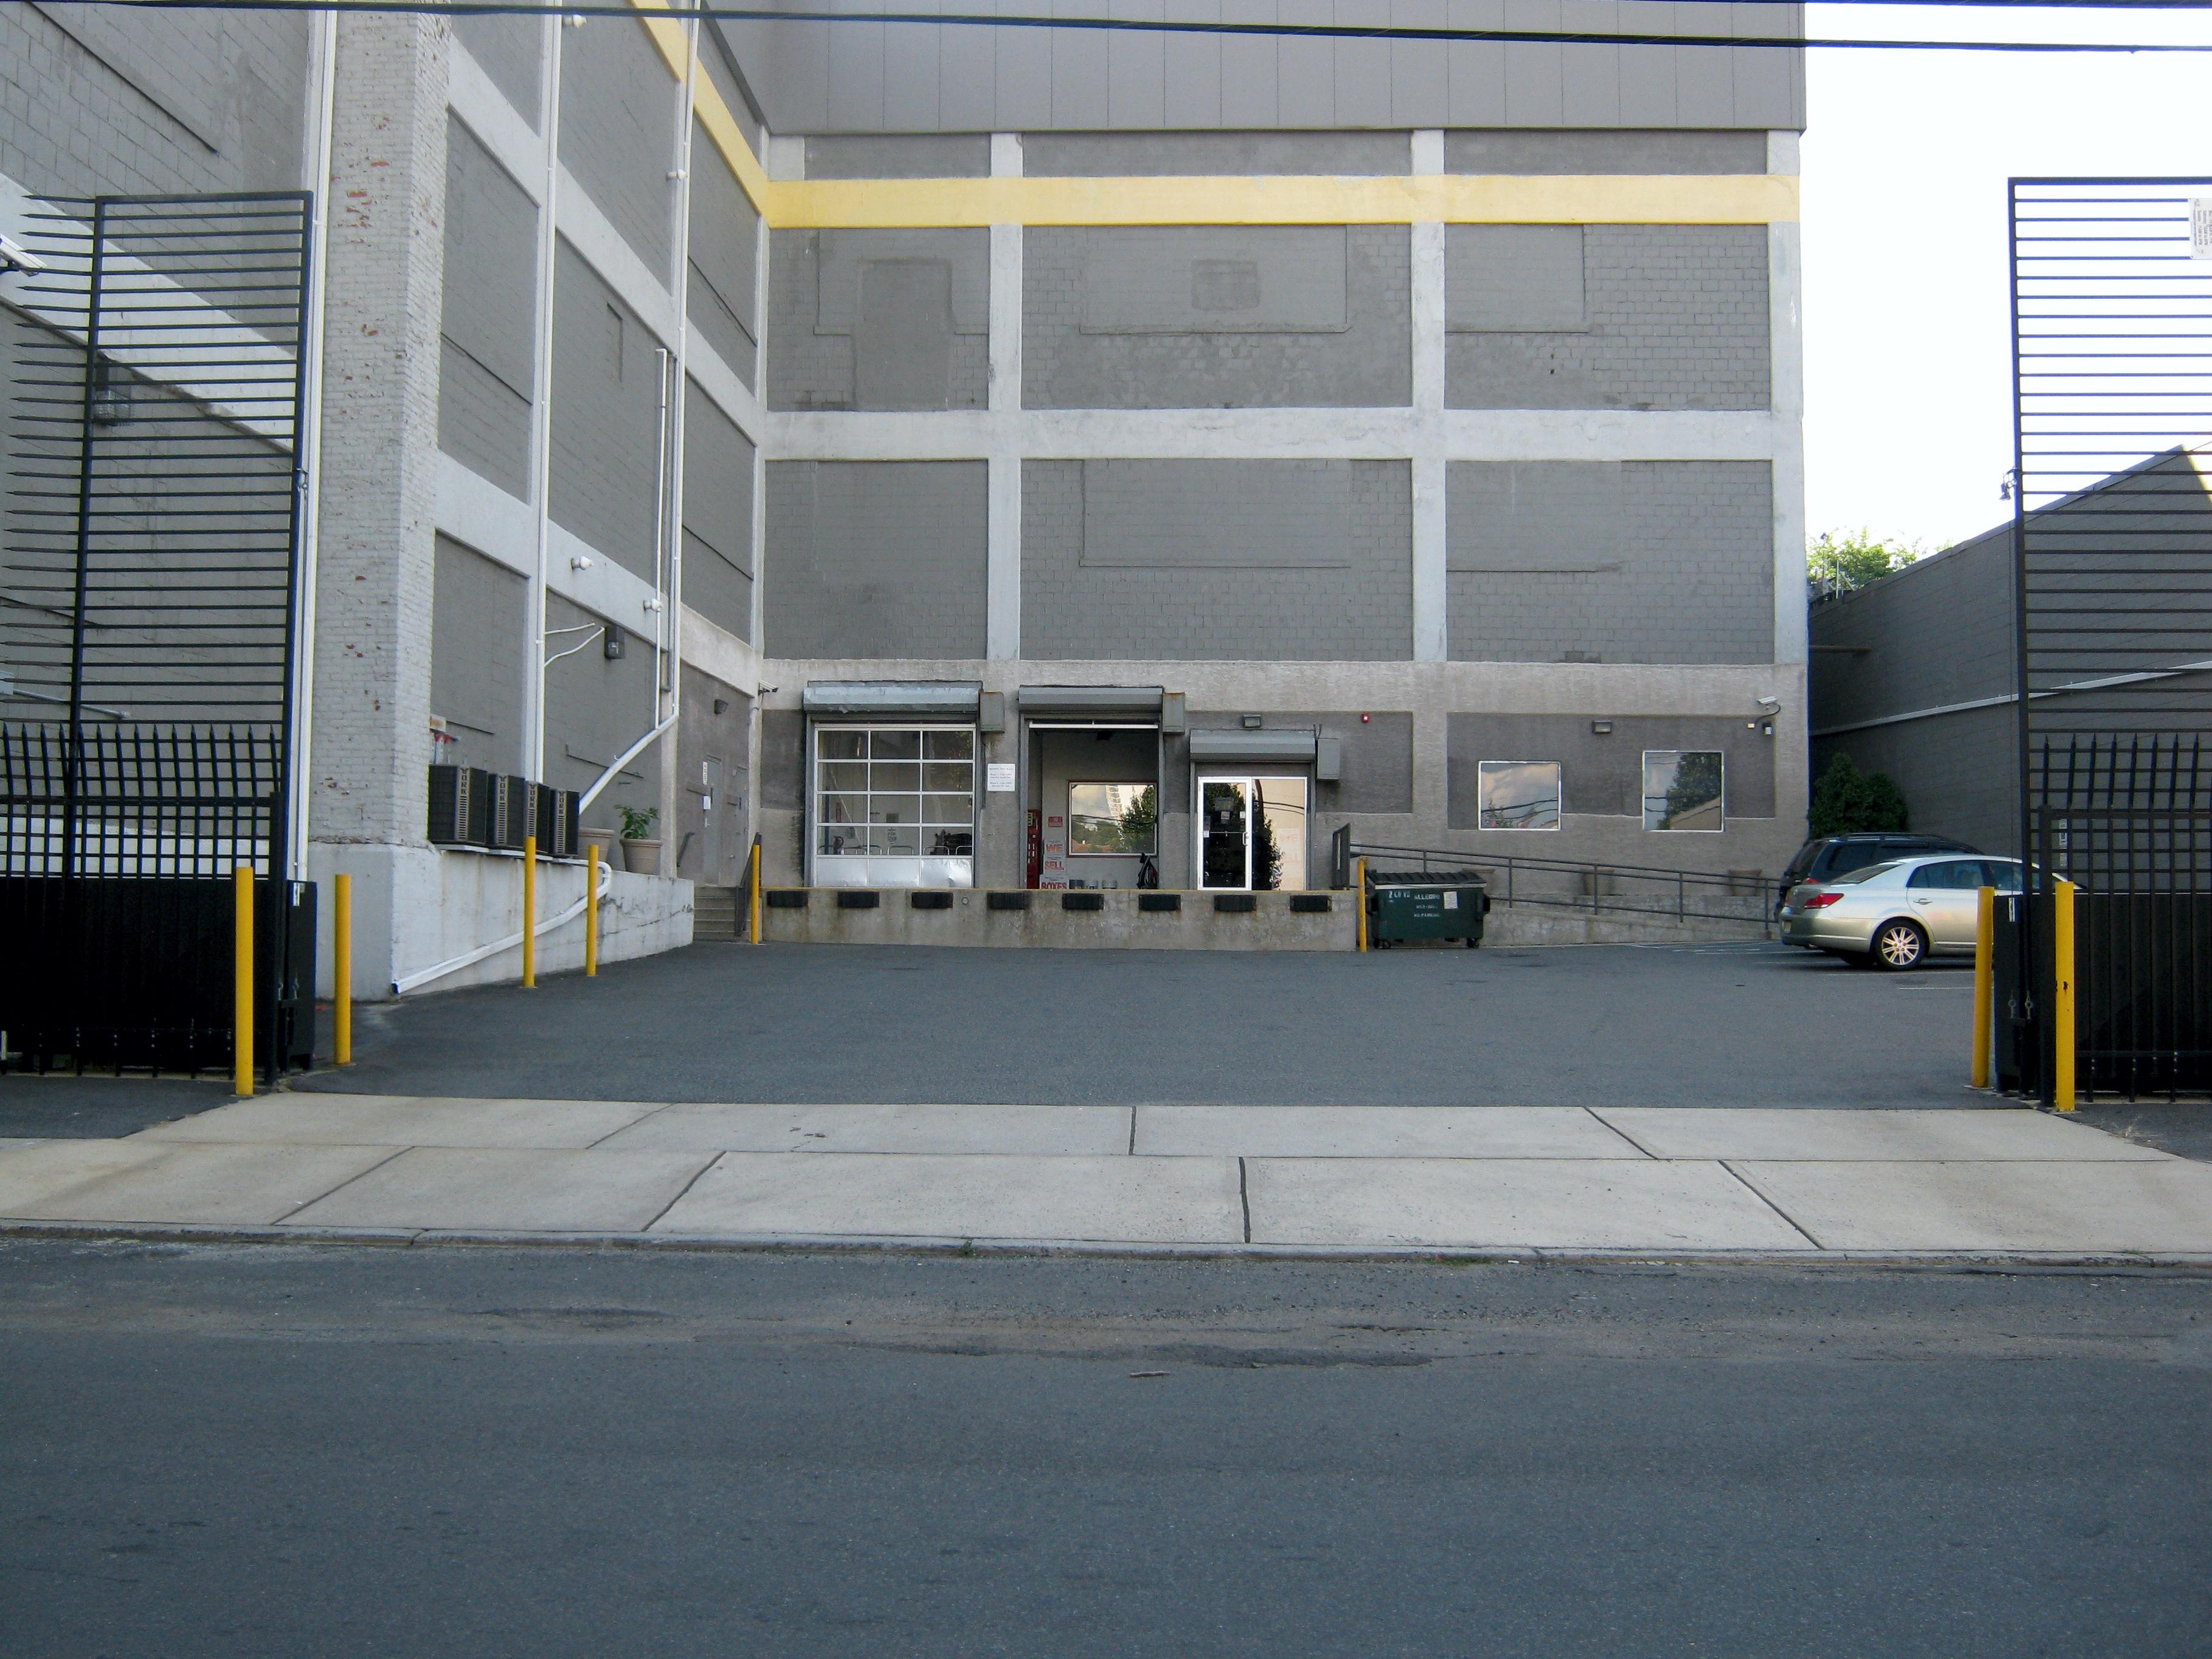 Storage King Usa In Newark Nj 07104 Chamberofcommercecom & Storage Units Newark Nj - Listitdallas